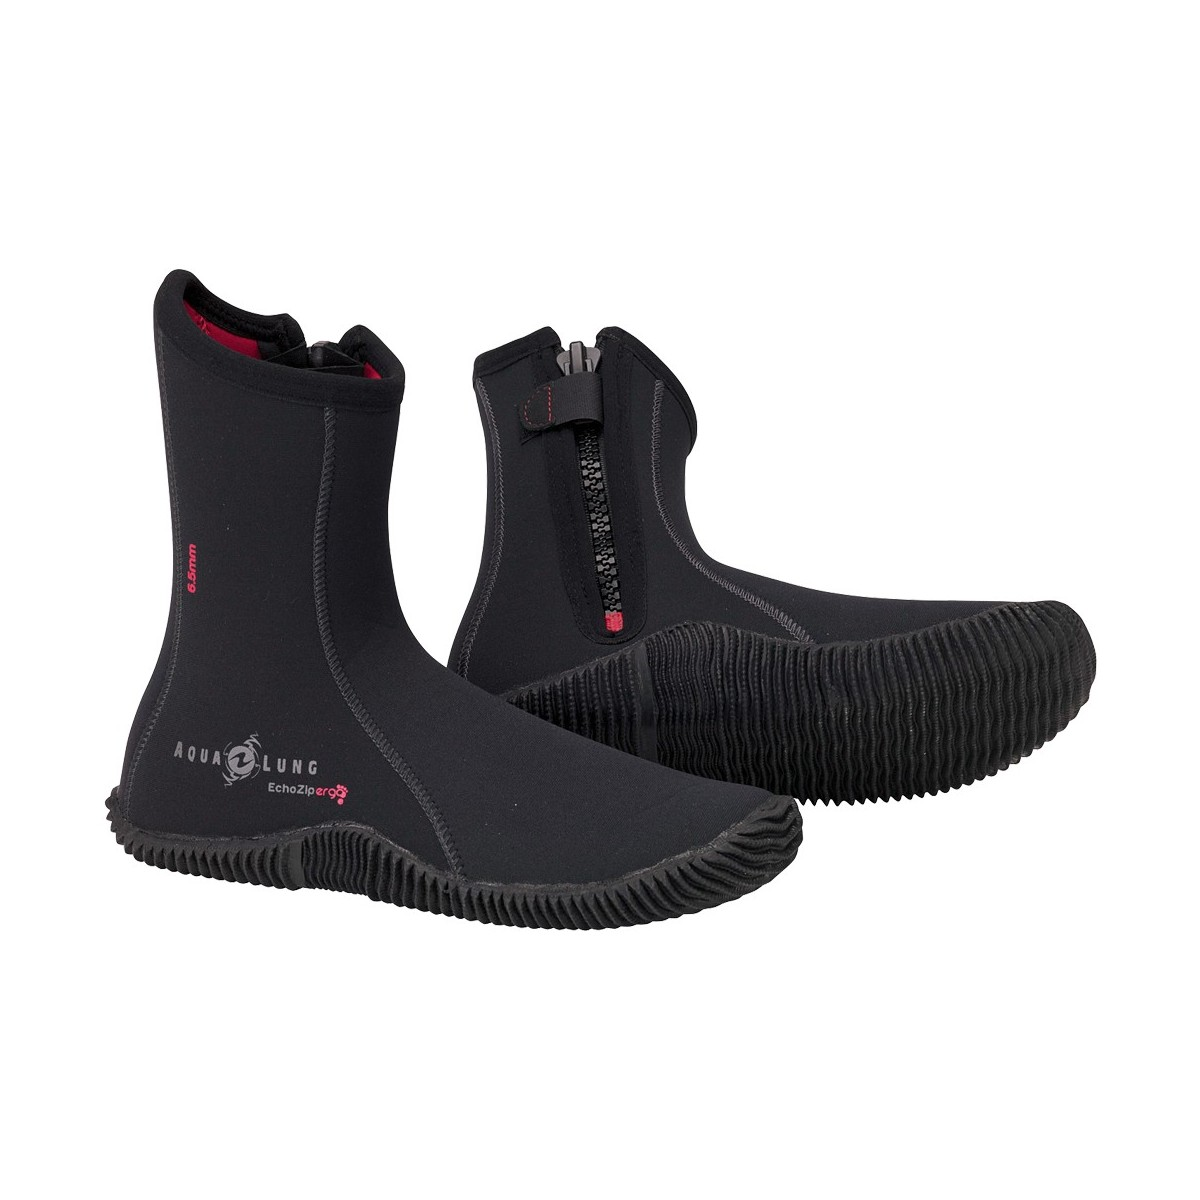 Aqua Lung 3mm Echozip Ergo Boot